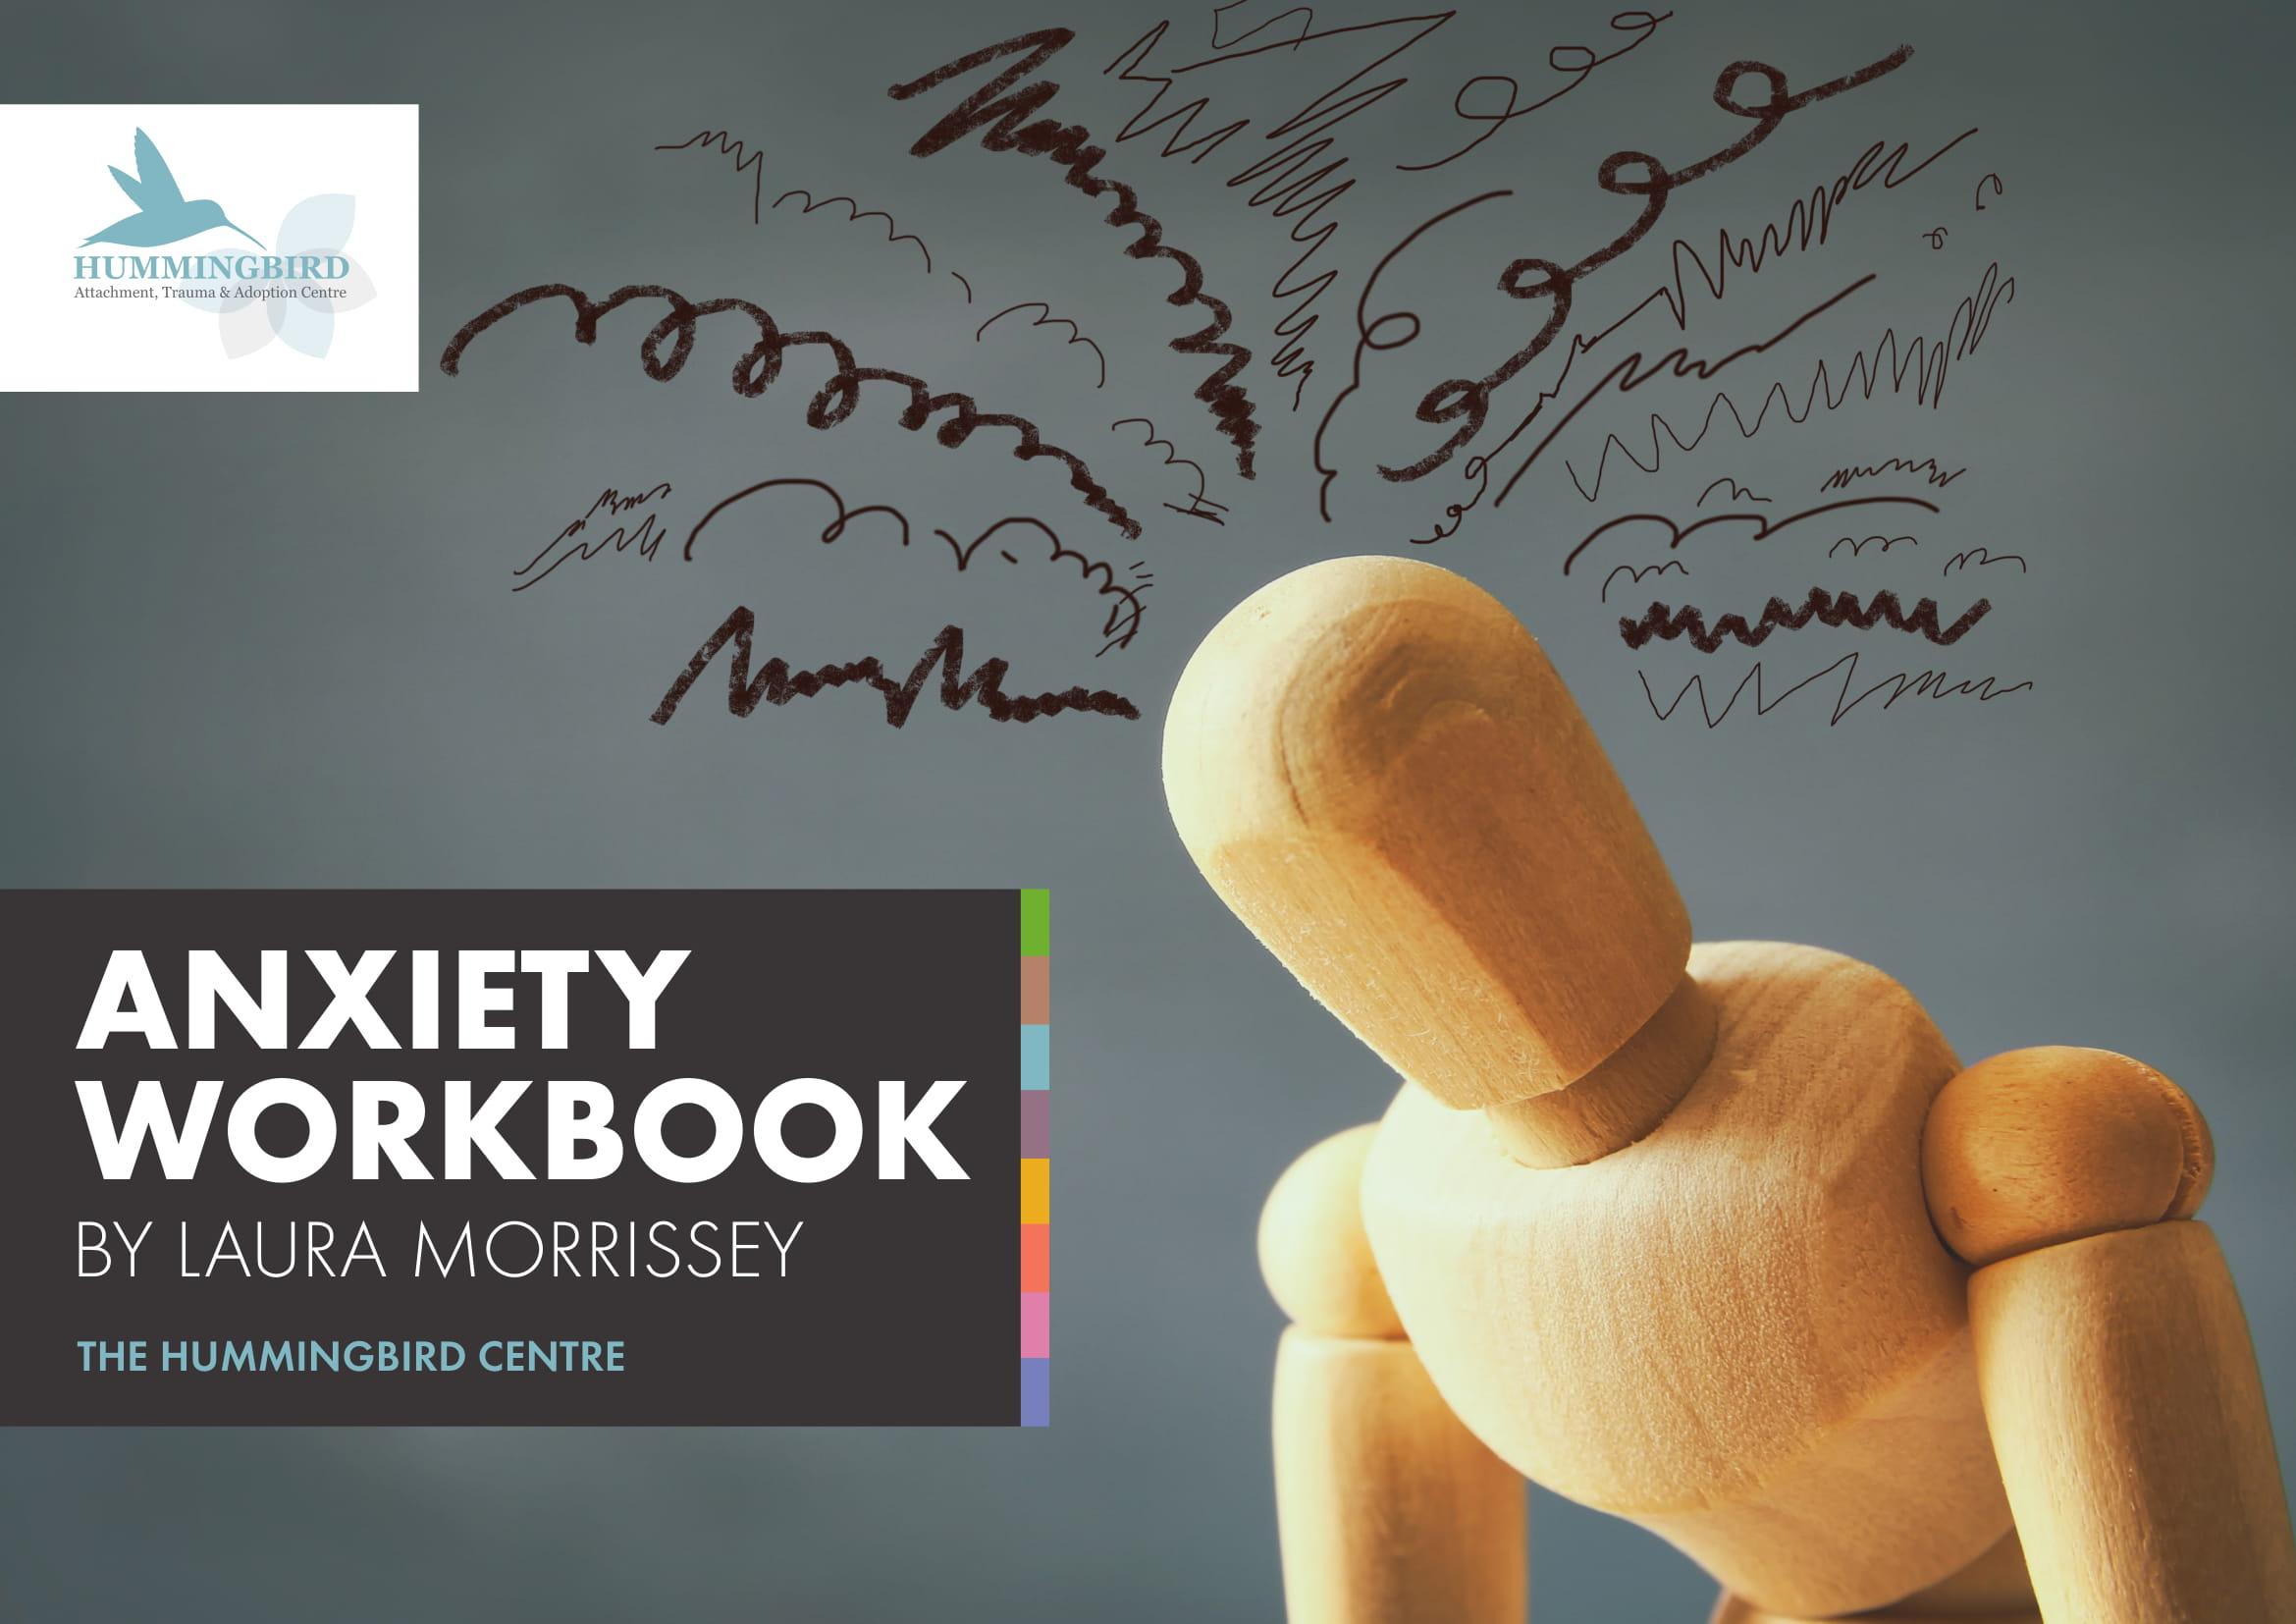 New Anxiety Workbook!